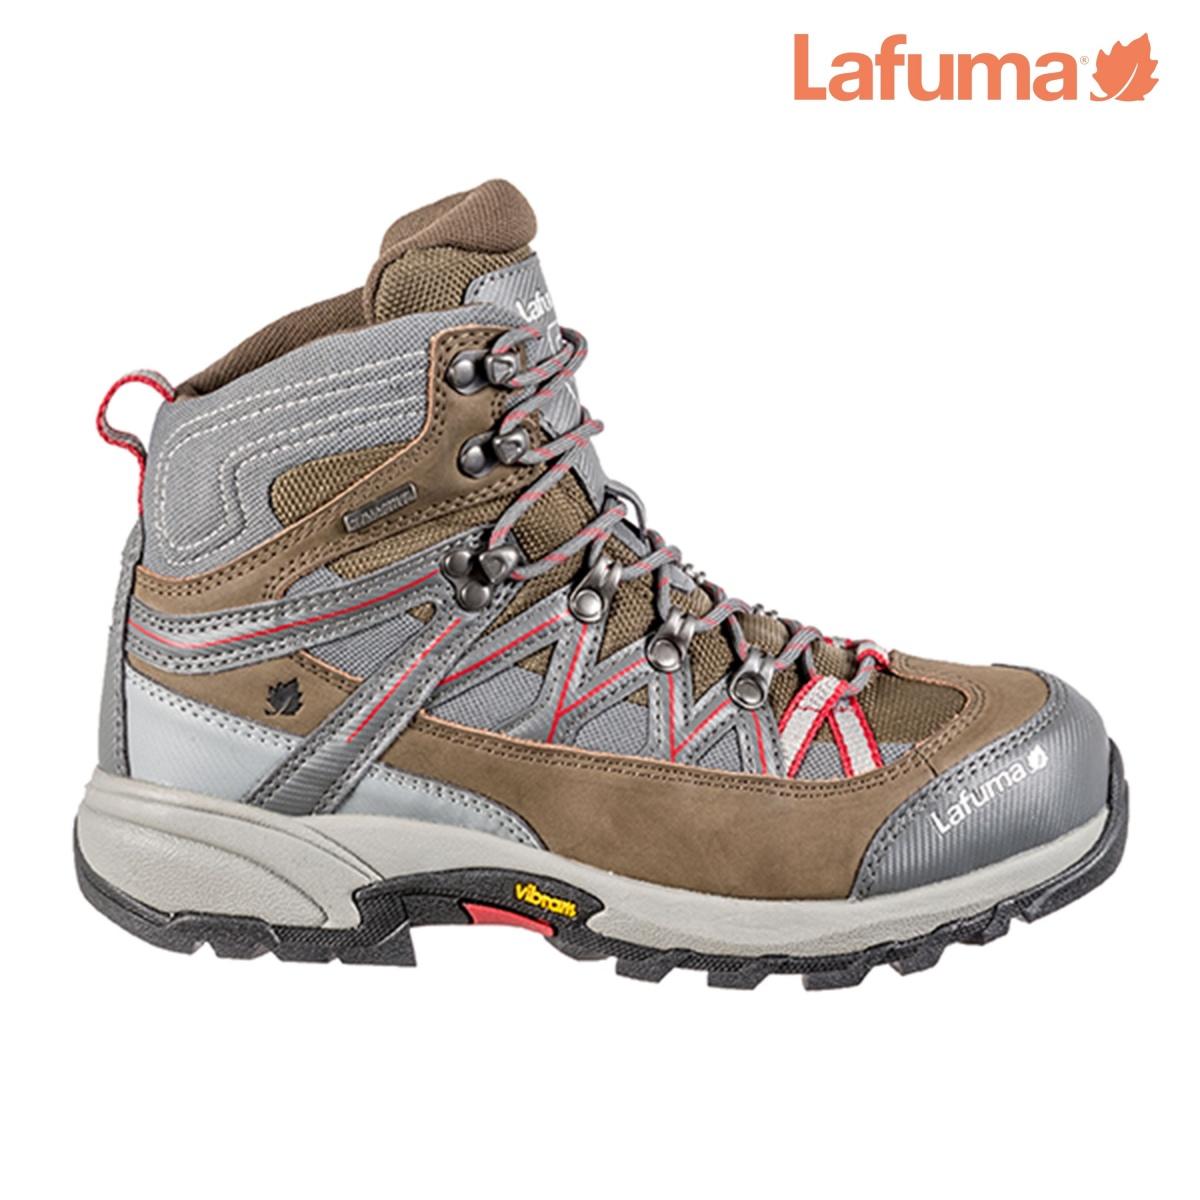 Lafuma Atakama II ld dámská treková obuv major brown barn  5c9669eaed